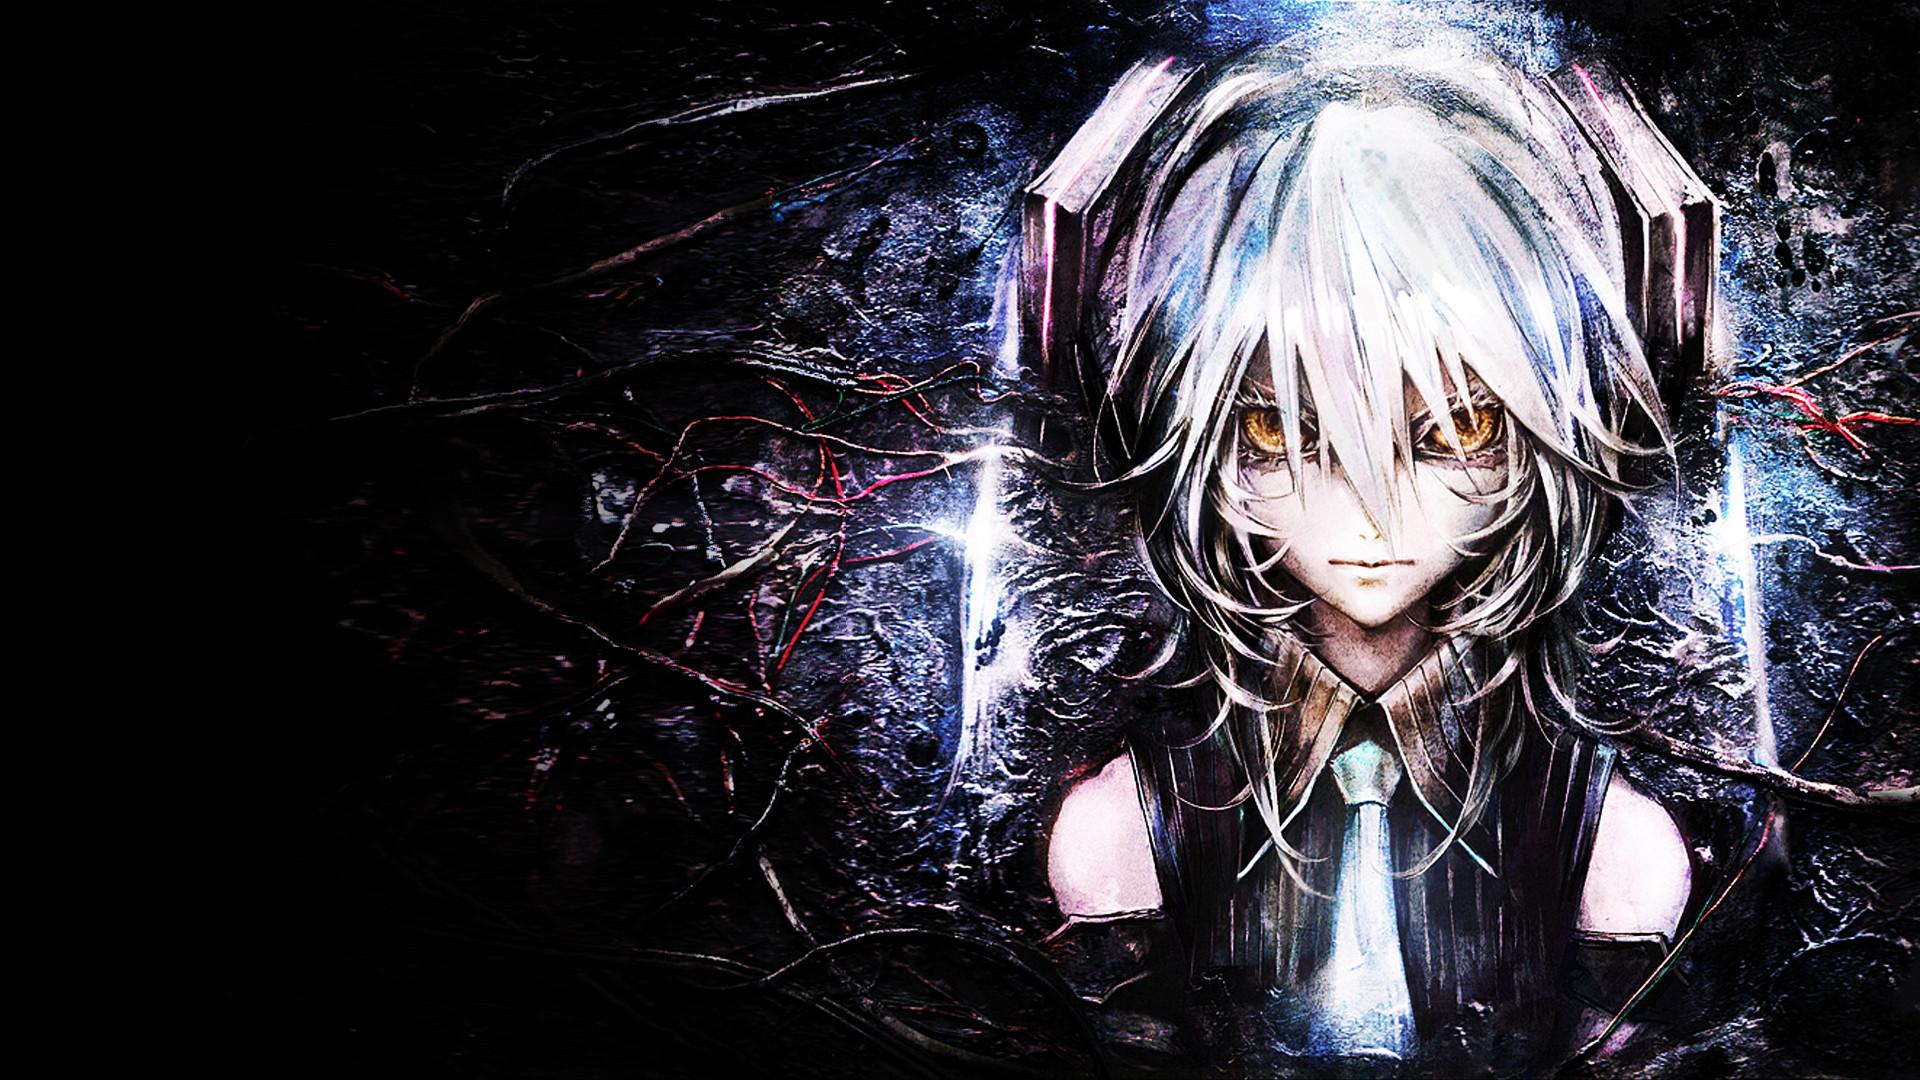 Cool Anime Wallpapers HD 1